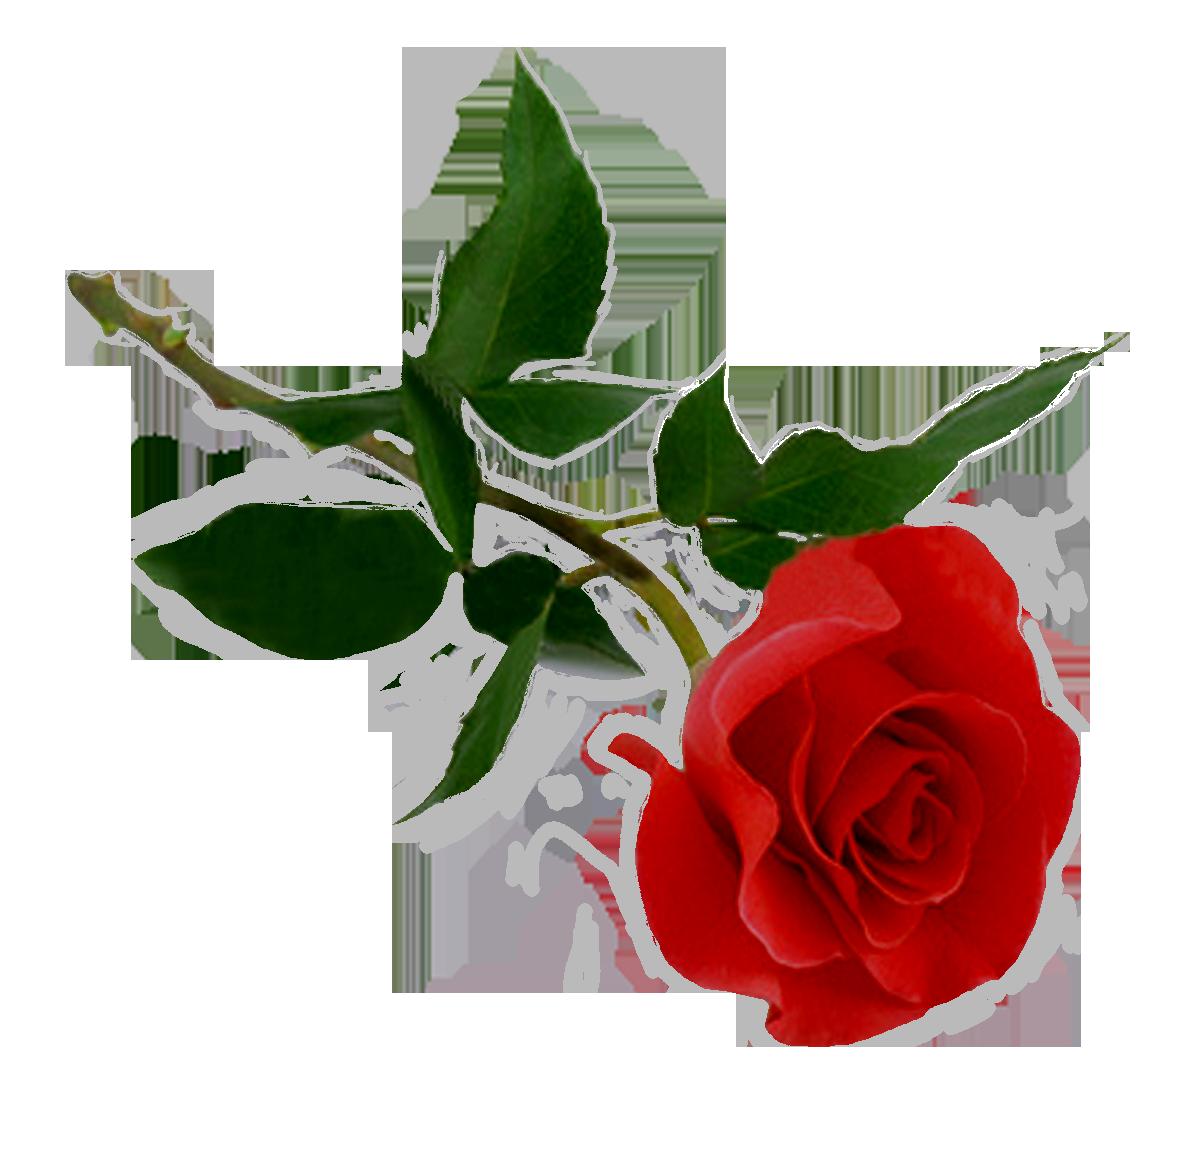 Rose png images. Red image purepng free